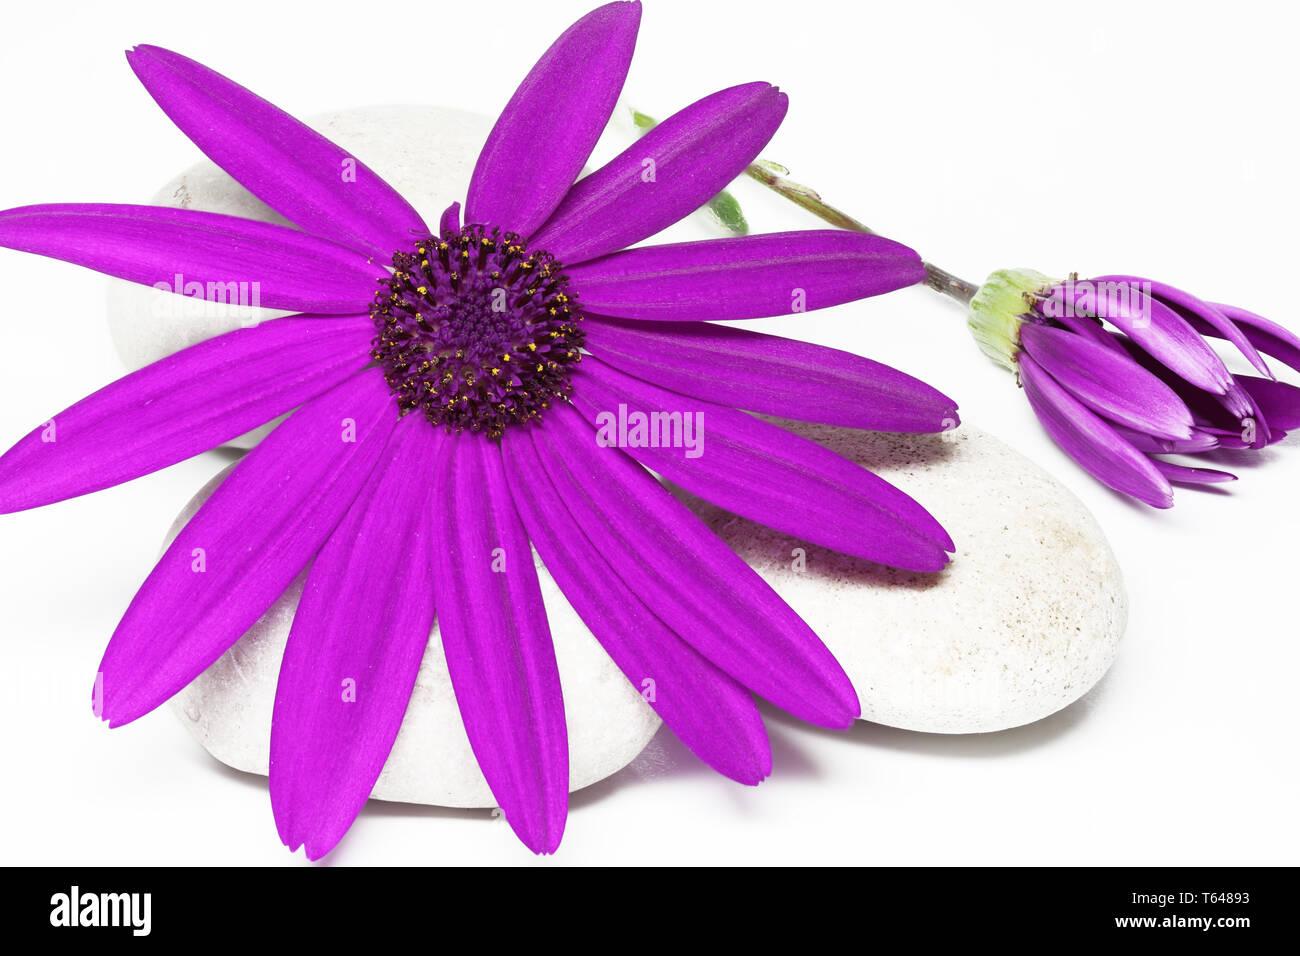 Senetti Pericalis Flower - Stock Image